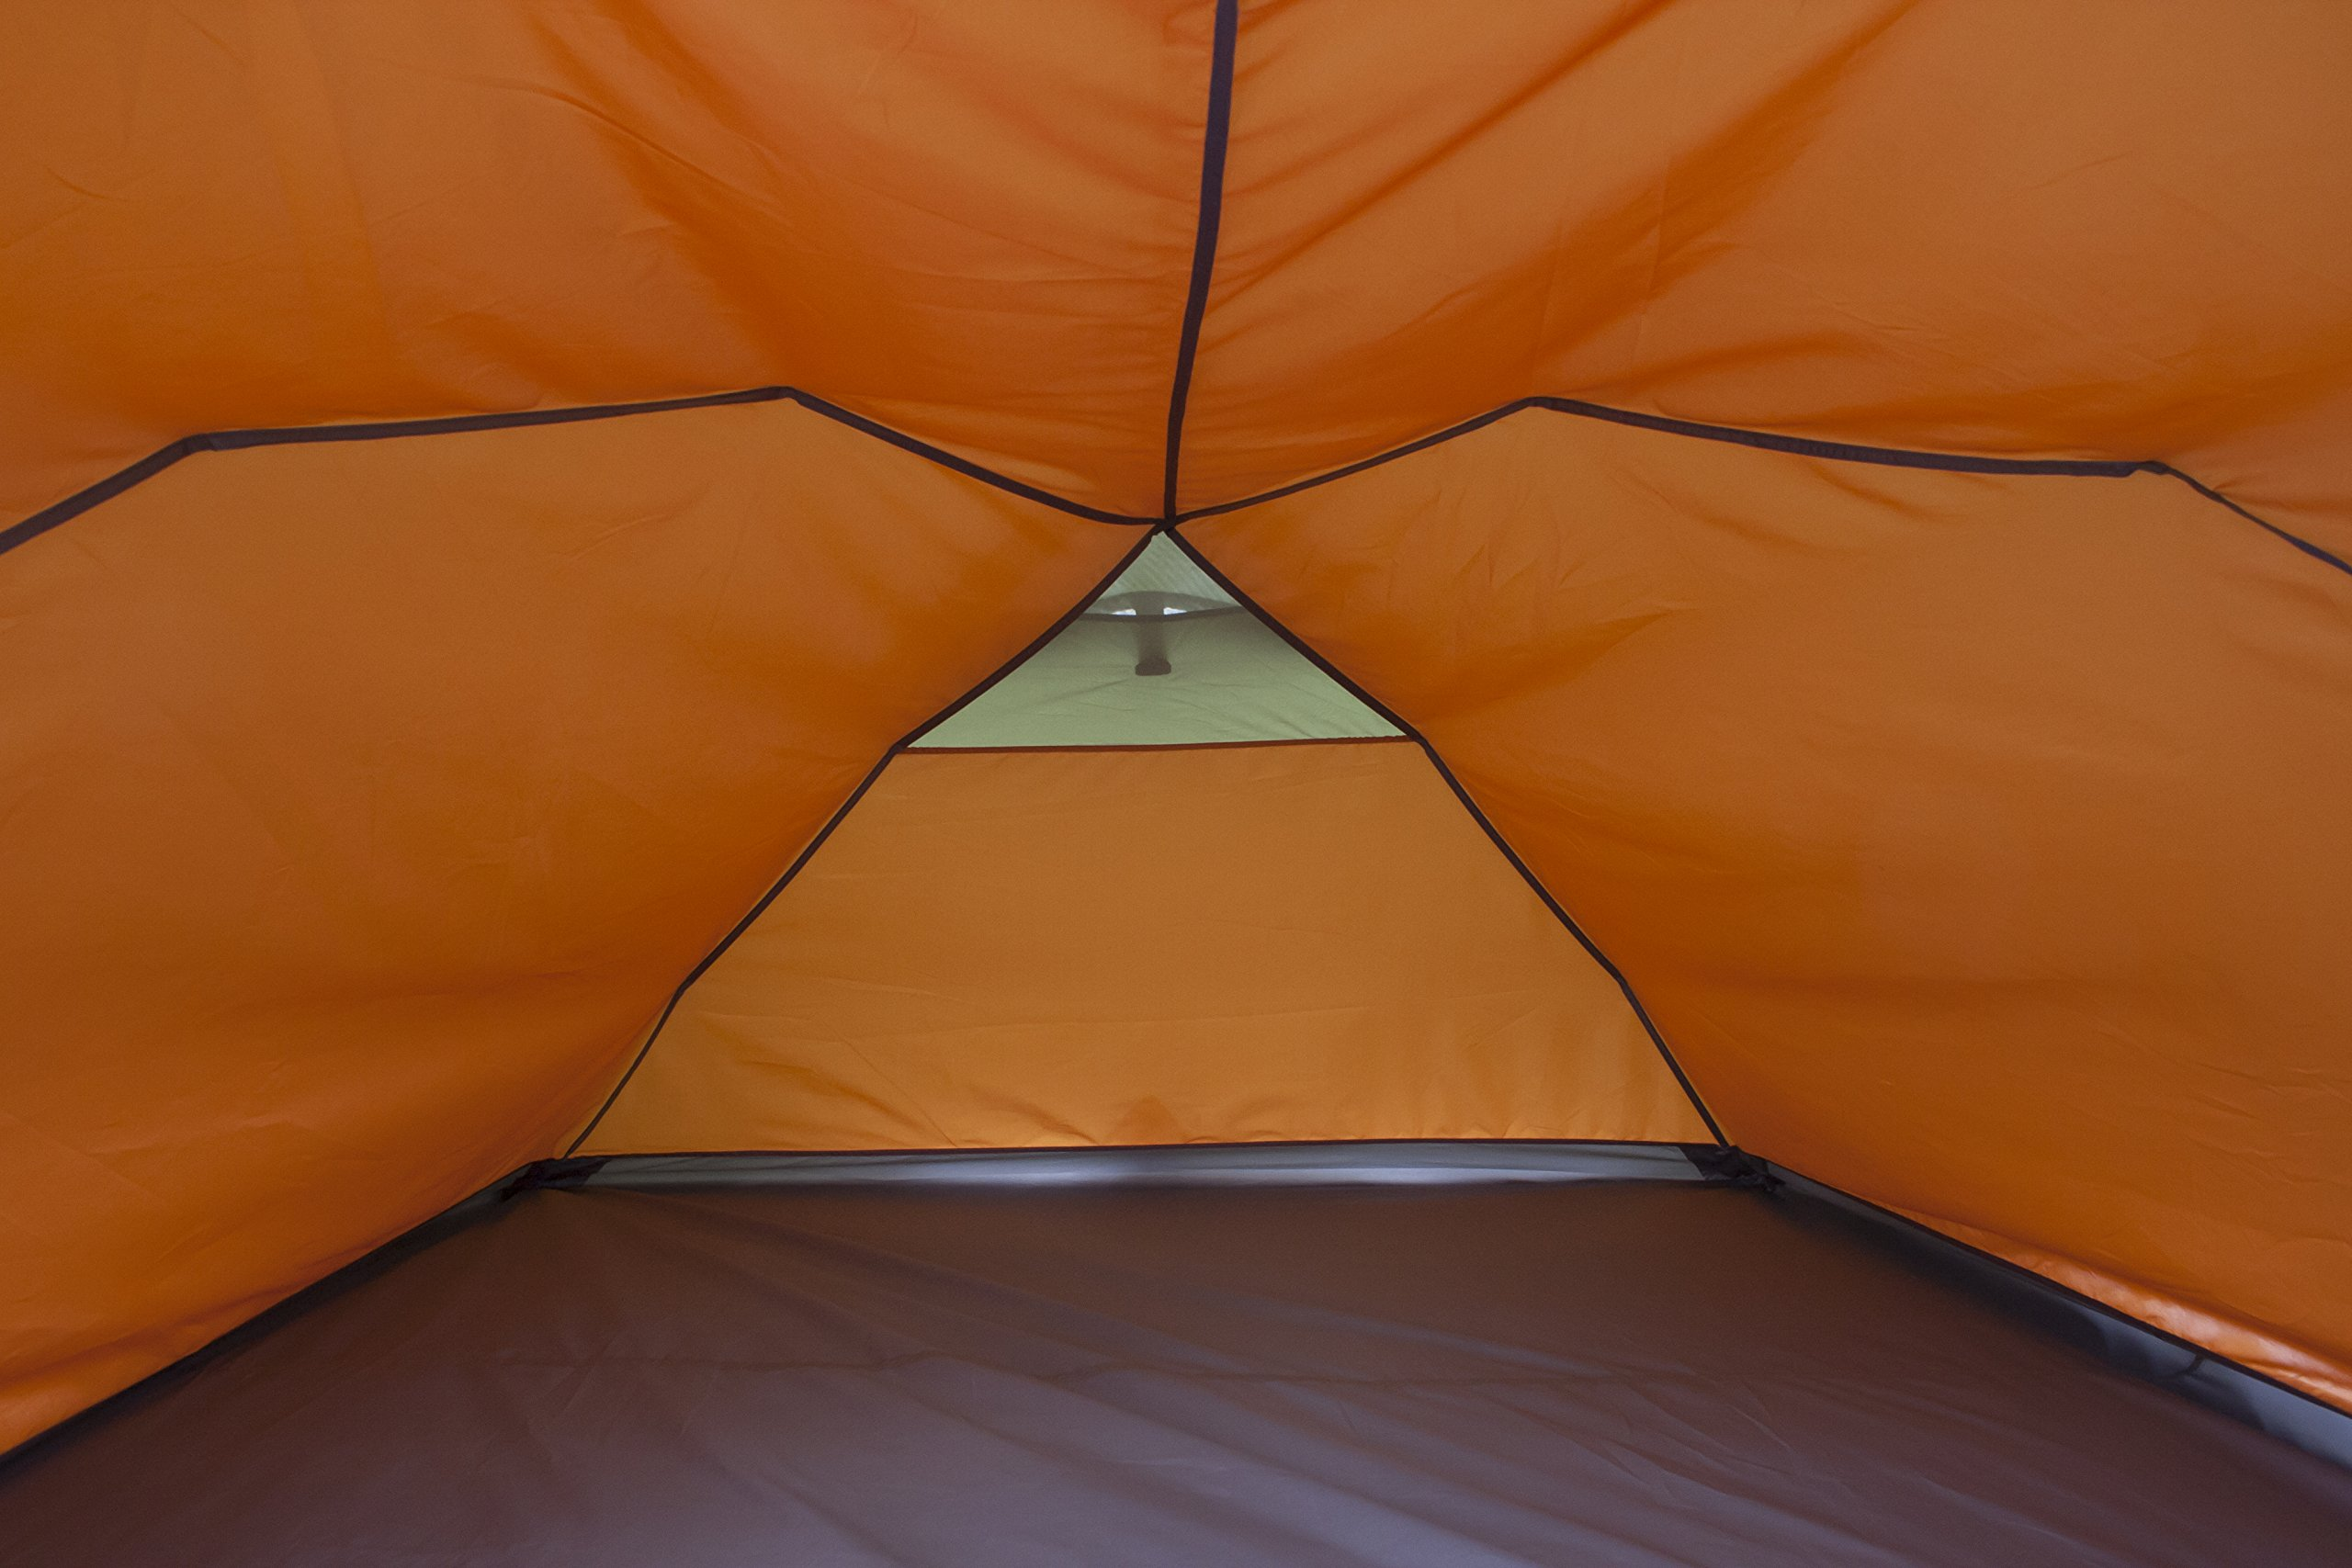 Vango Hydra Trekking Tent, Cactus Green, 200 7